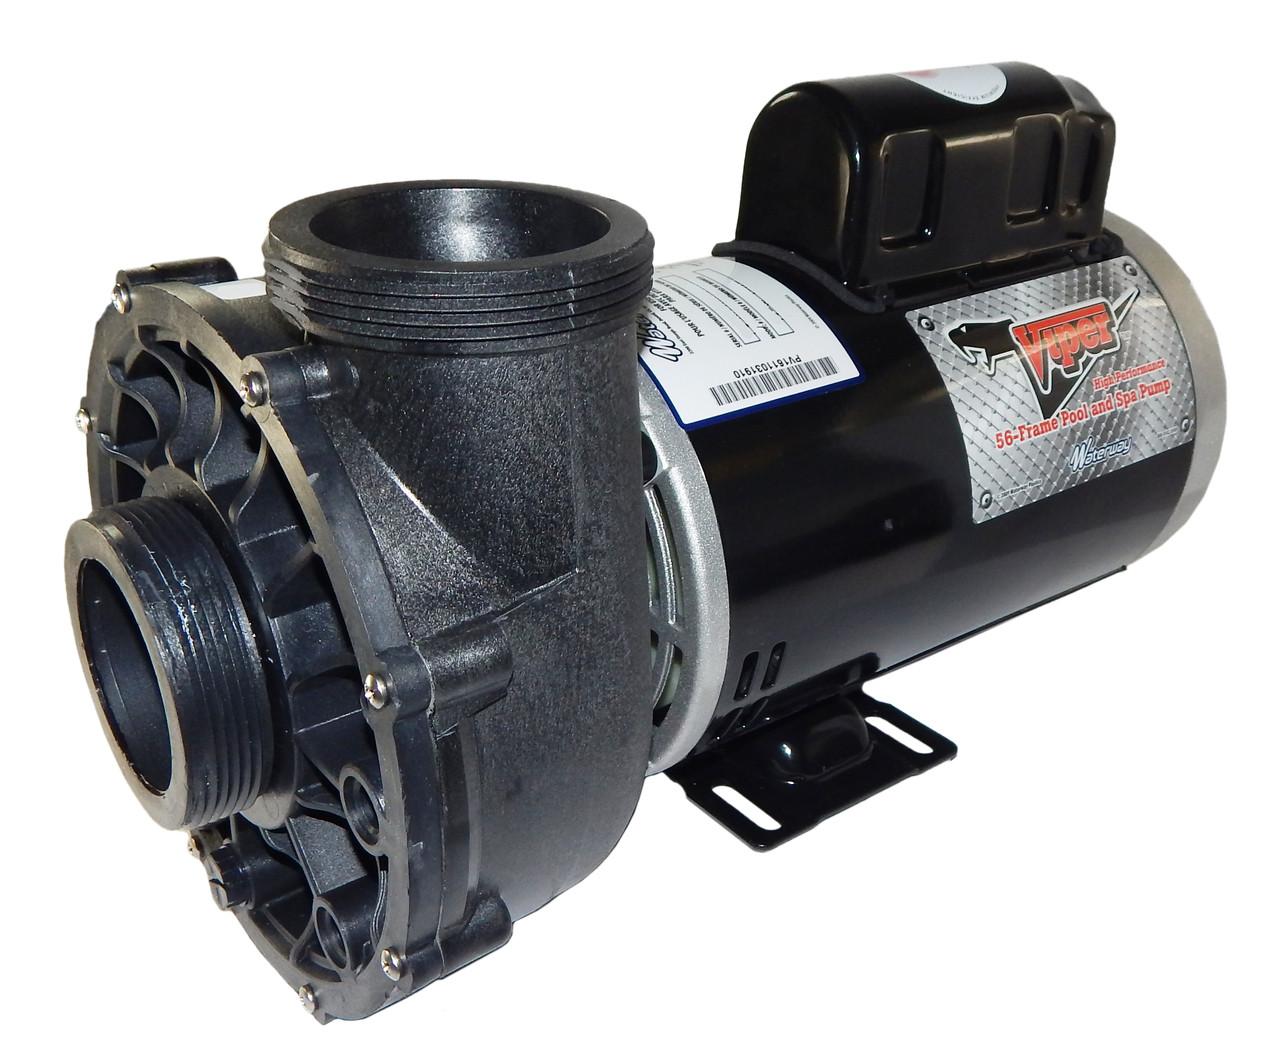 Waterway Pumps 3721621 Wiring Diagram Basic Guide Emerson Pool Pump Motor 4hp Viper Spa Side Discharge 2 Speed 56 Frame Rh Electricmotorwarehouse Com Bn35ss Hayward Troubleshooting